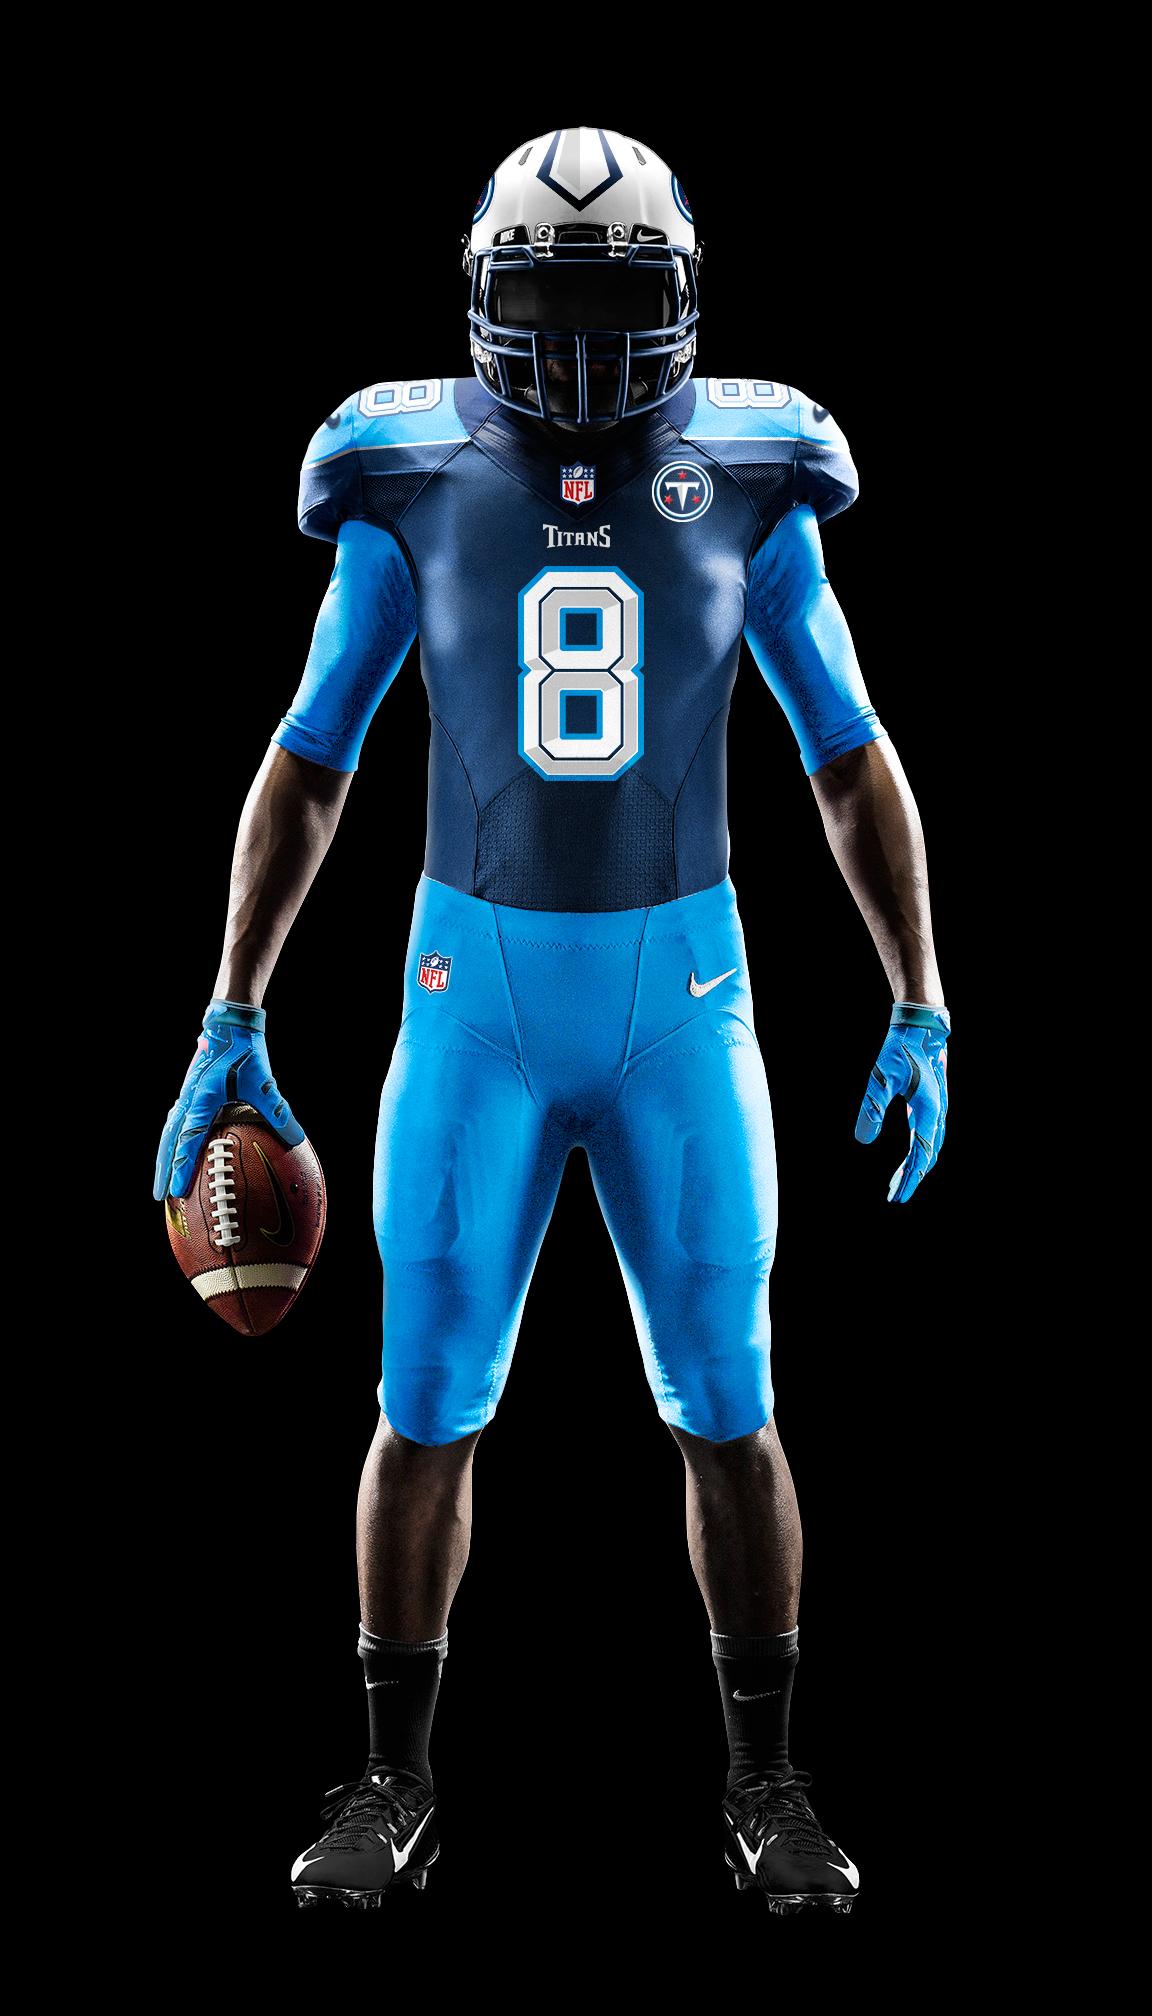 Tennessee Titans Uniform Concept on Behance